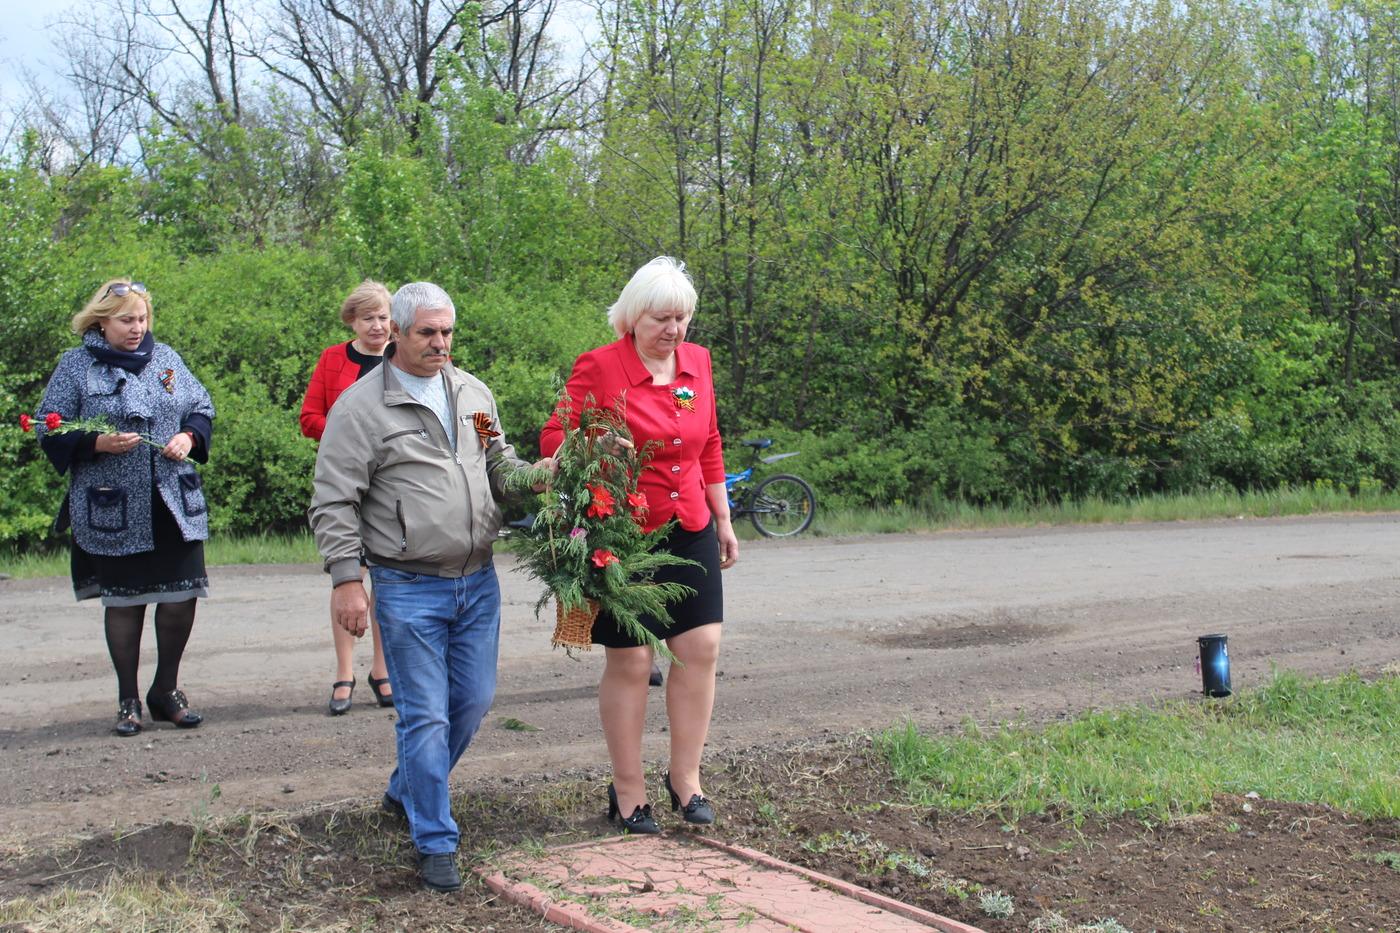 Активисты ОД «Мир Луганщине» отметил День Победы велопробегом 2